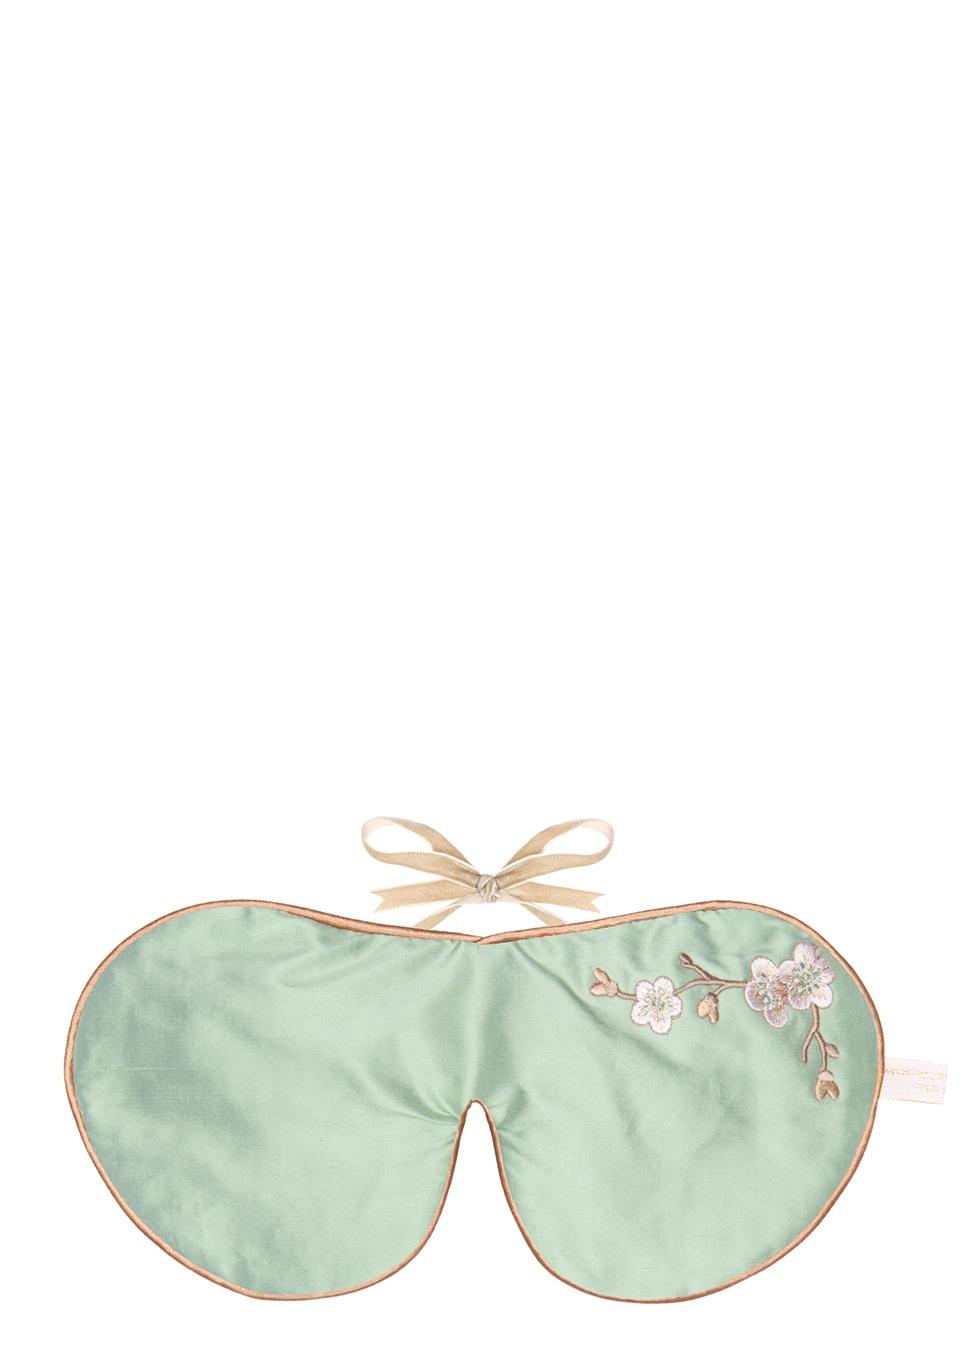 Classic Lavender Eye Mask - Jade